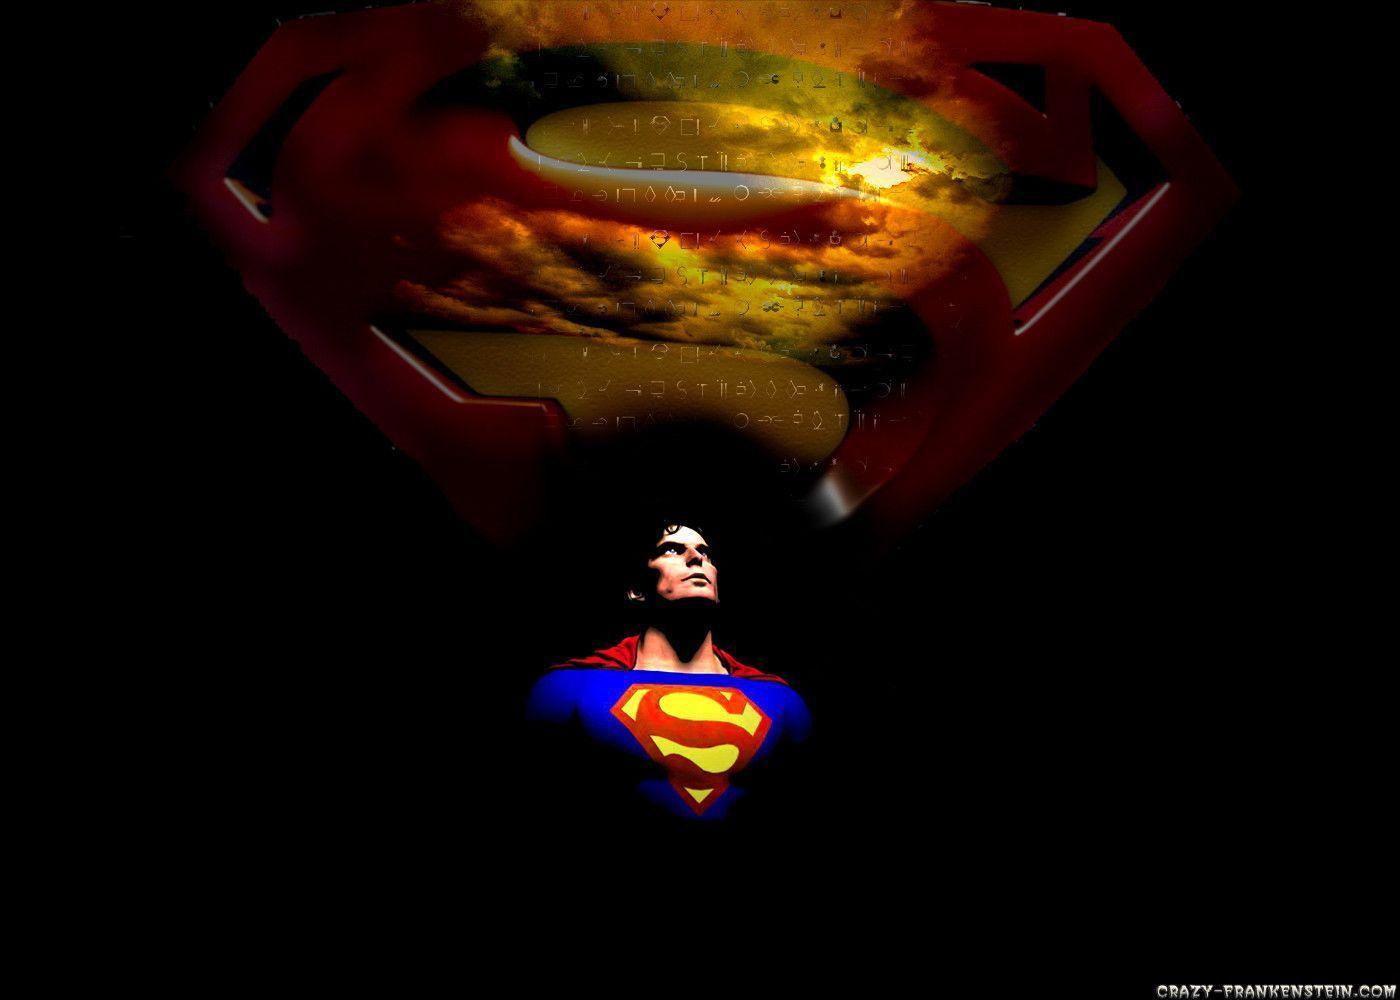 evil superman wallpaper hd - photo #10